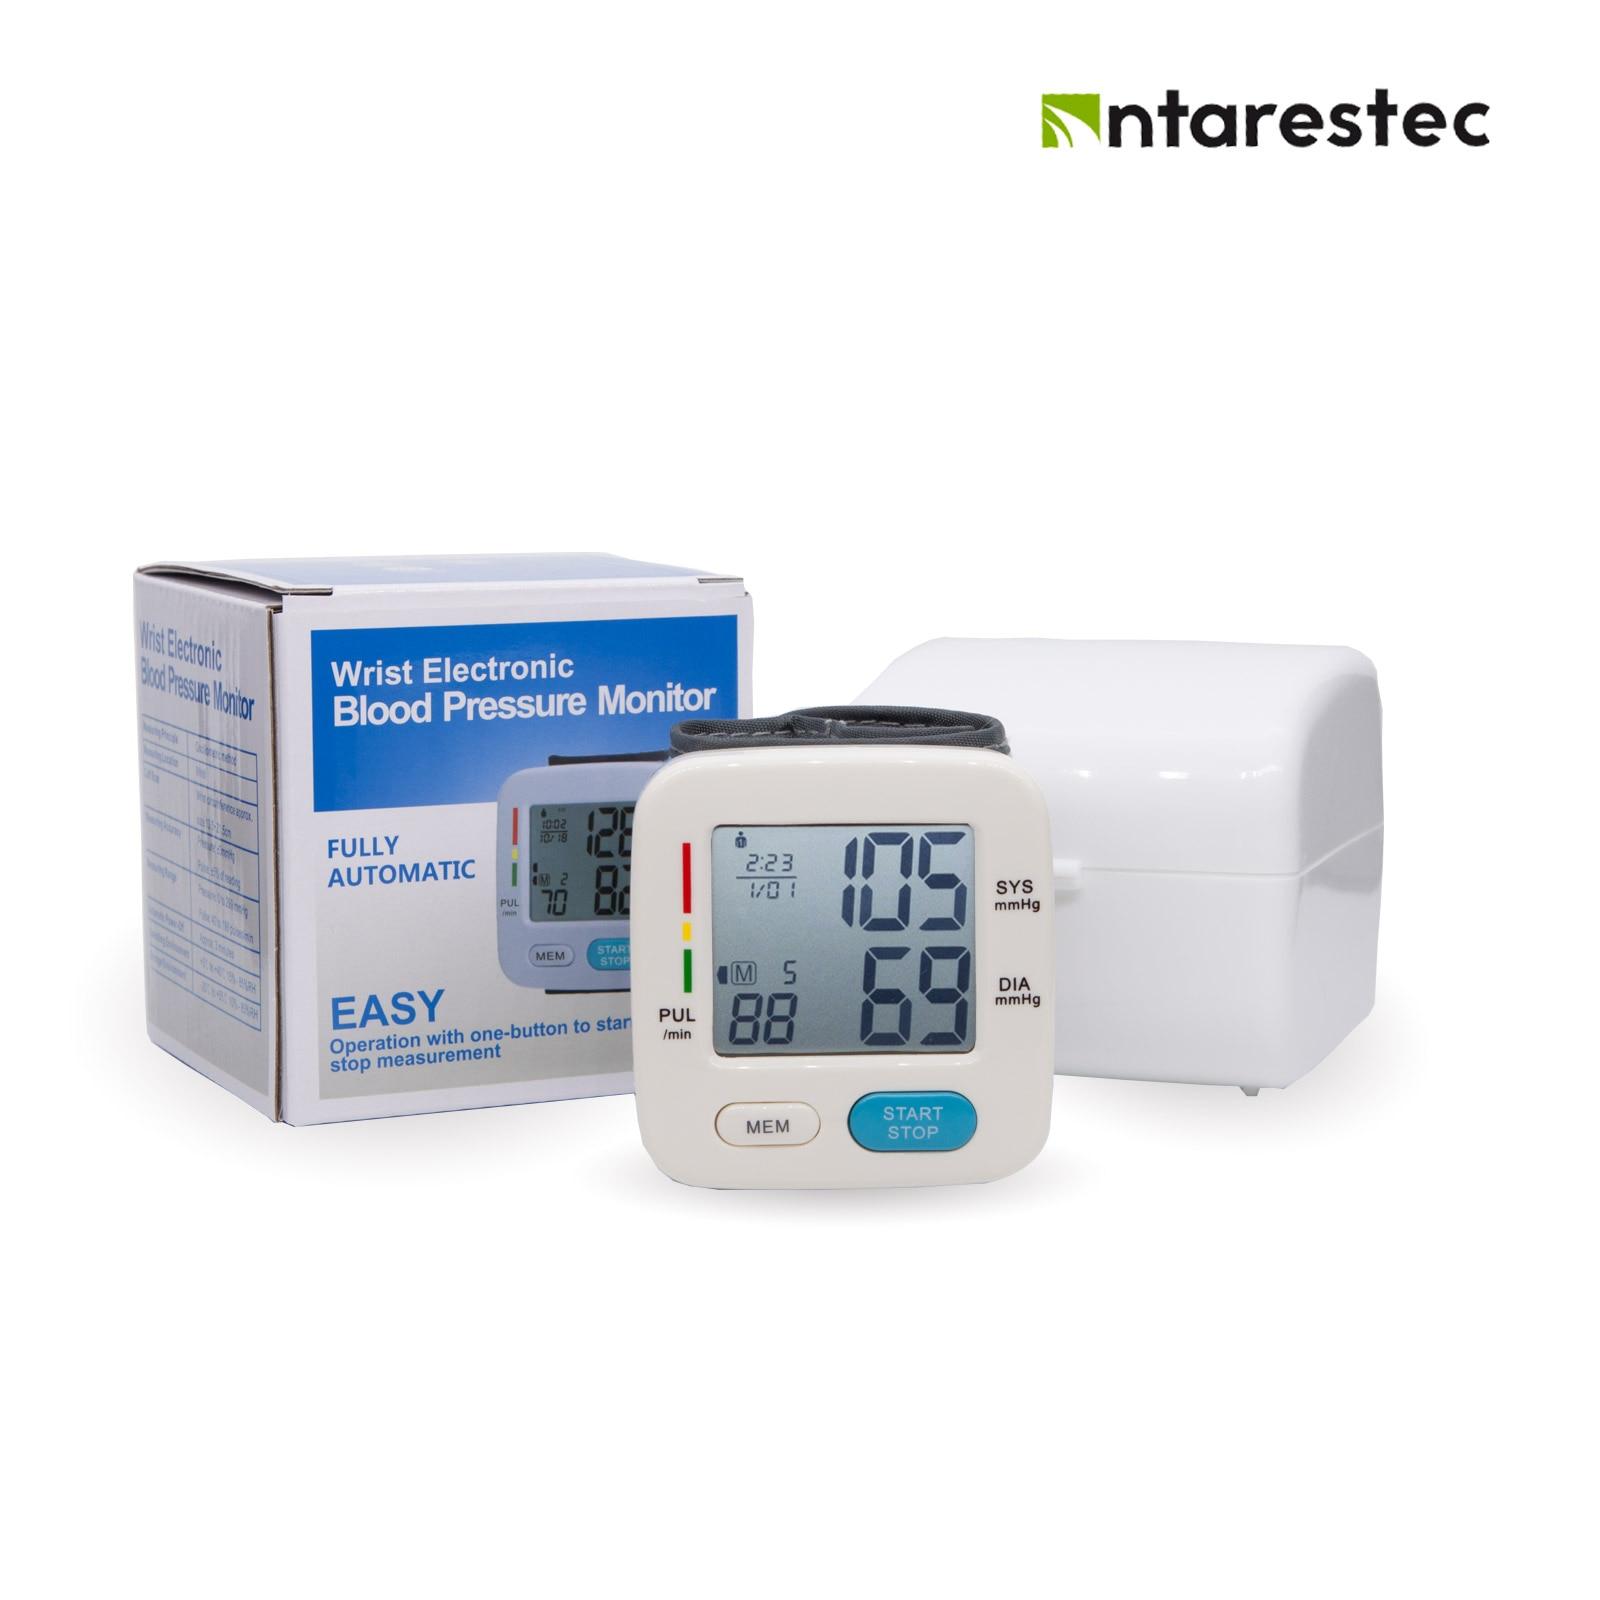 Handgelenk Blutdruck Monitor Meter Mess Herzschlag Rate Pulse Meter Messen LCD Digital Blutdruckmessgerät Antarestec PH30